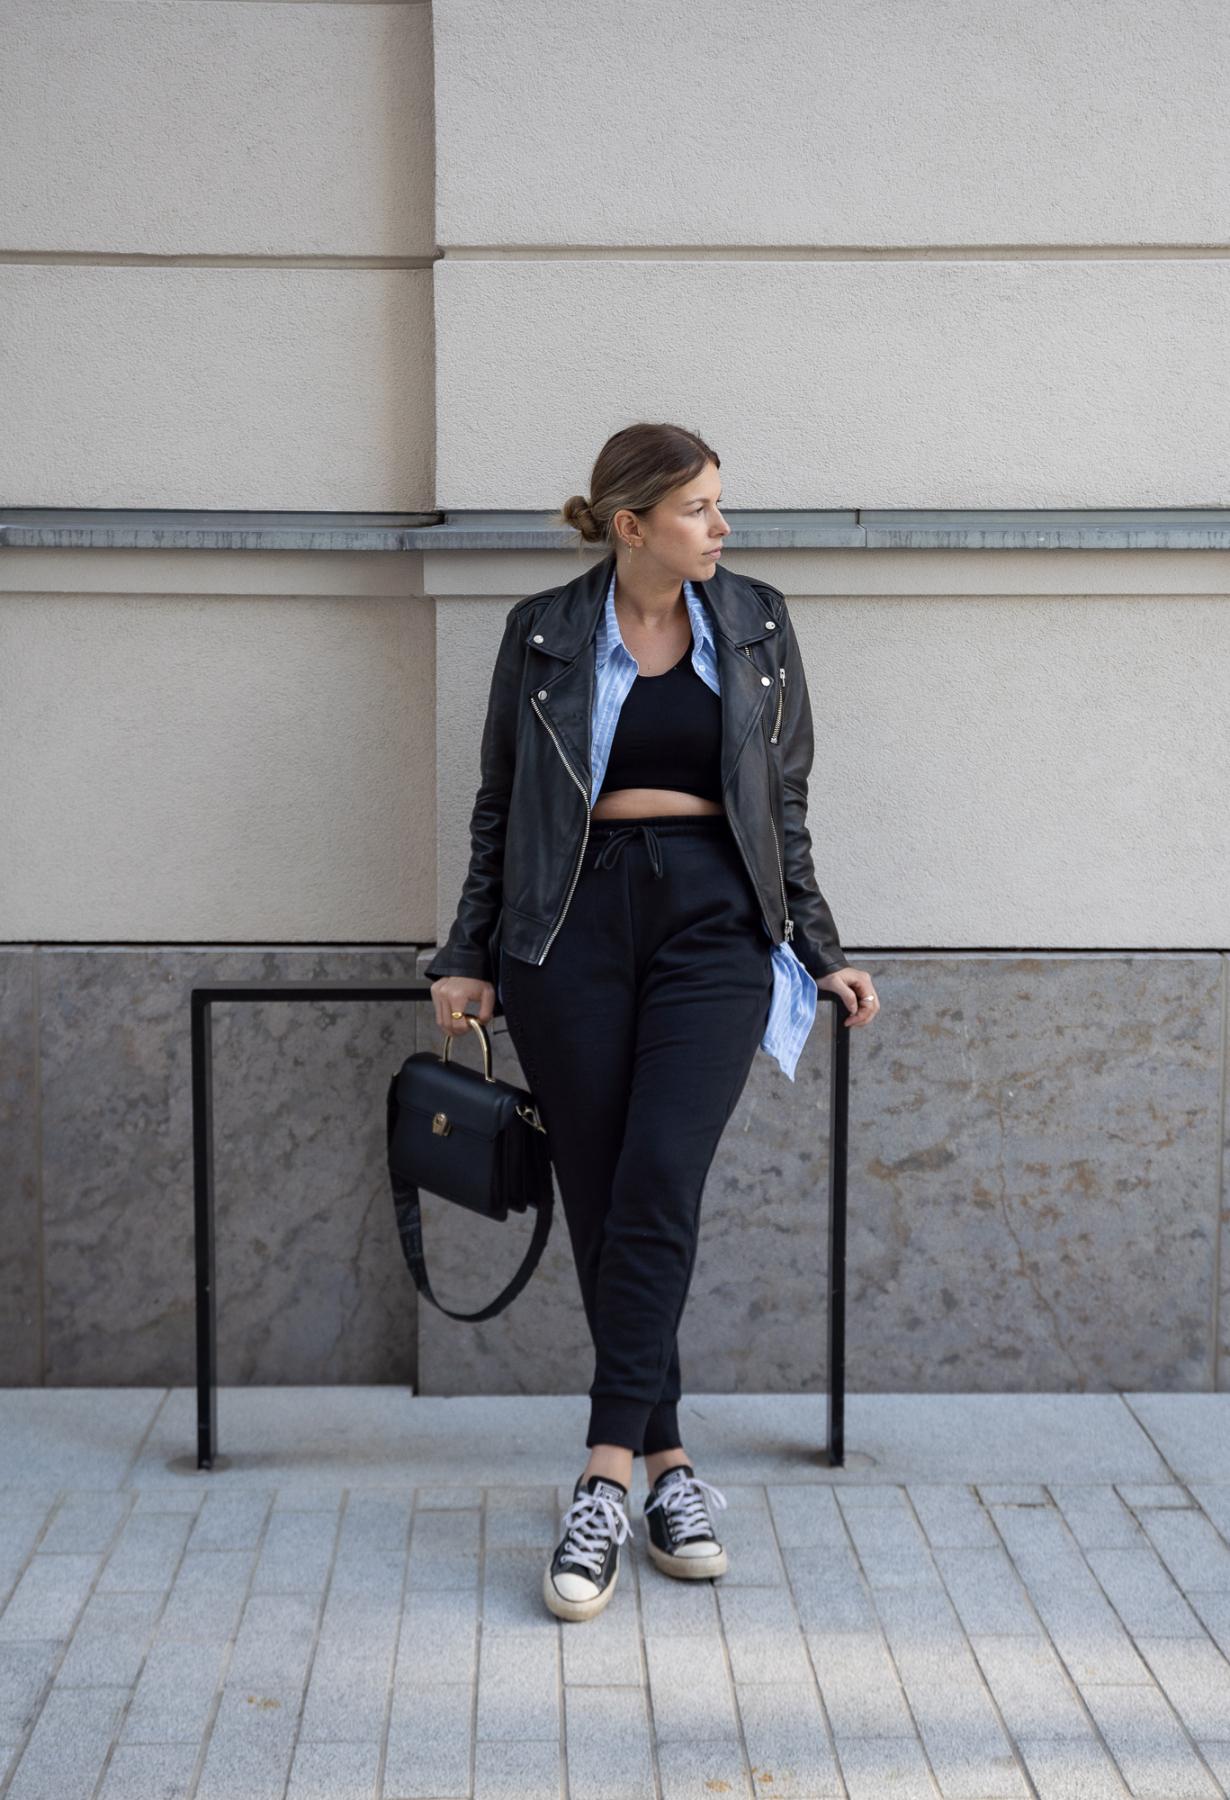 athleisure-outfits-sweat-pants-jogger-sneaker-new-balance-aline-kaplan-modeblog-berlin-lederjacke